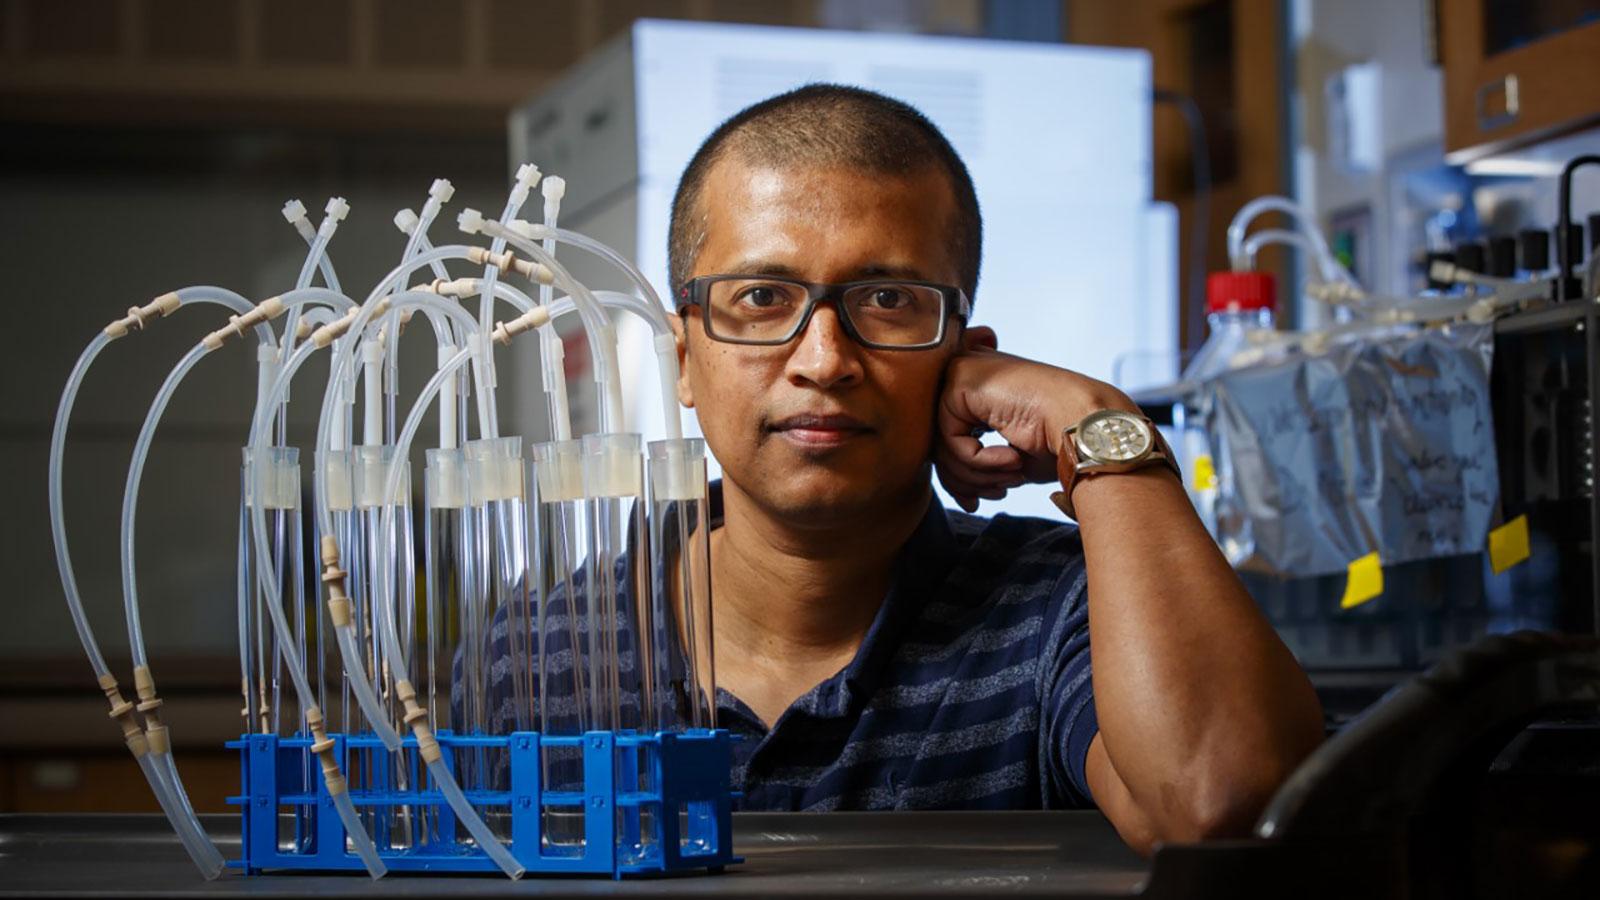 Rajib Saha, assistant professor of chemical and biomolecular engineering